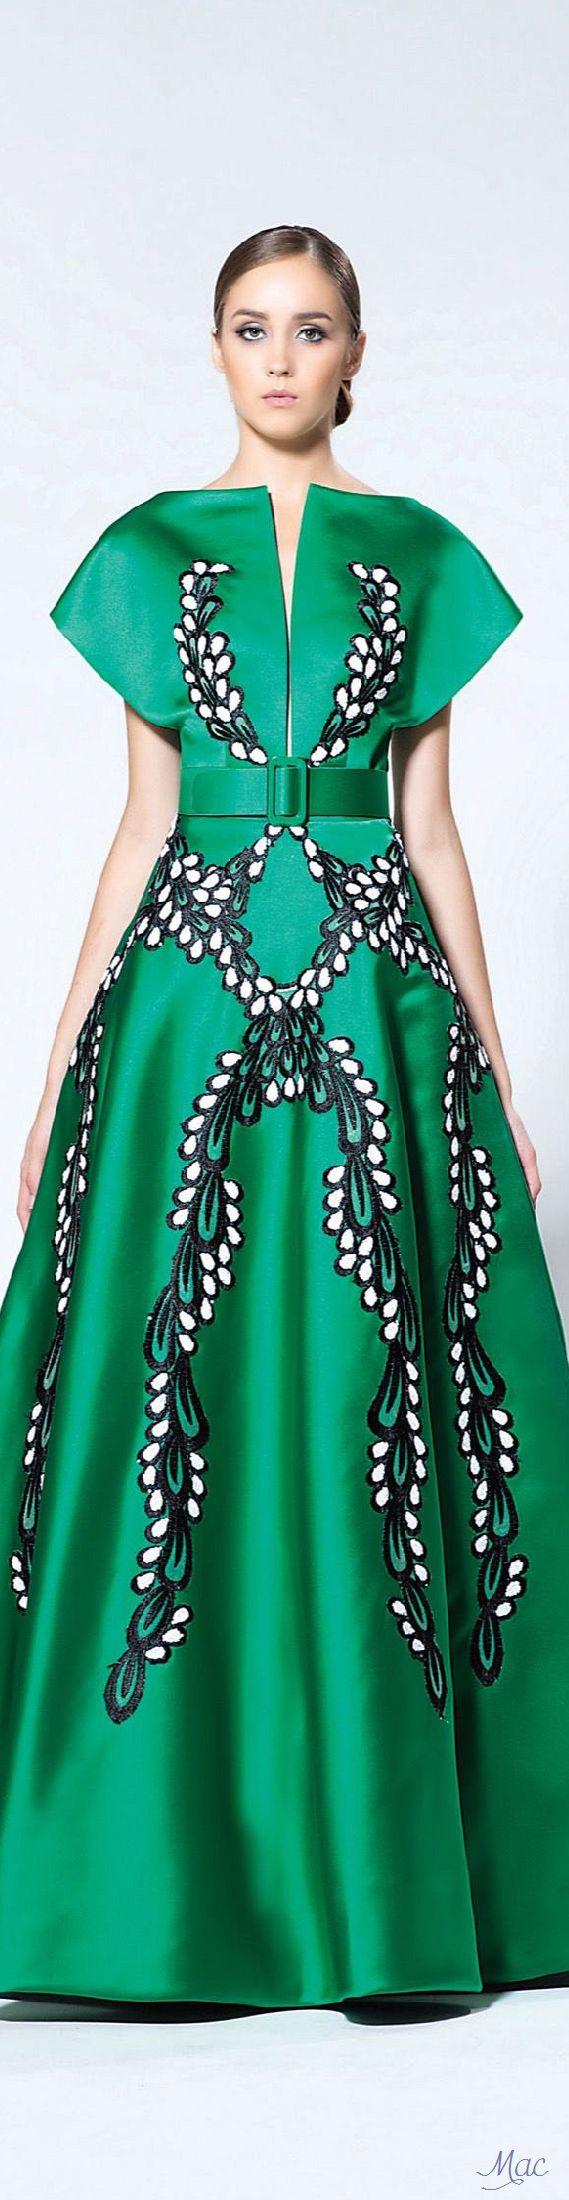 Fall 2016 Haute Couture - Antonios Couture